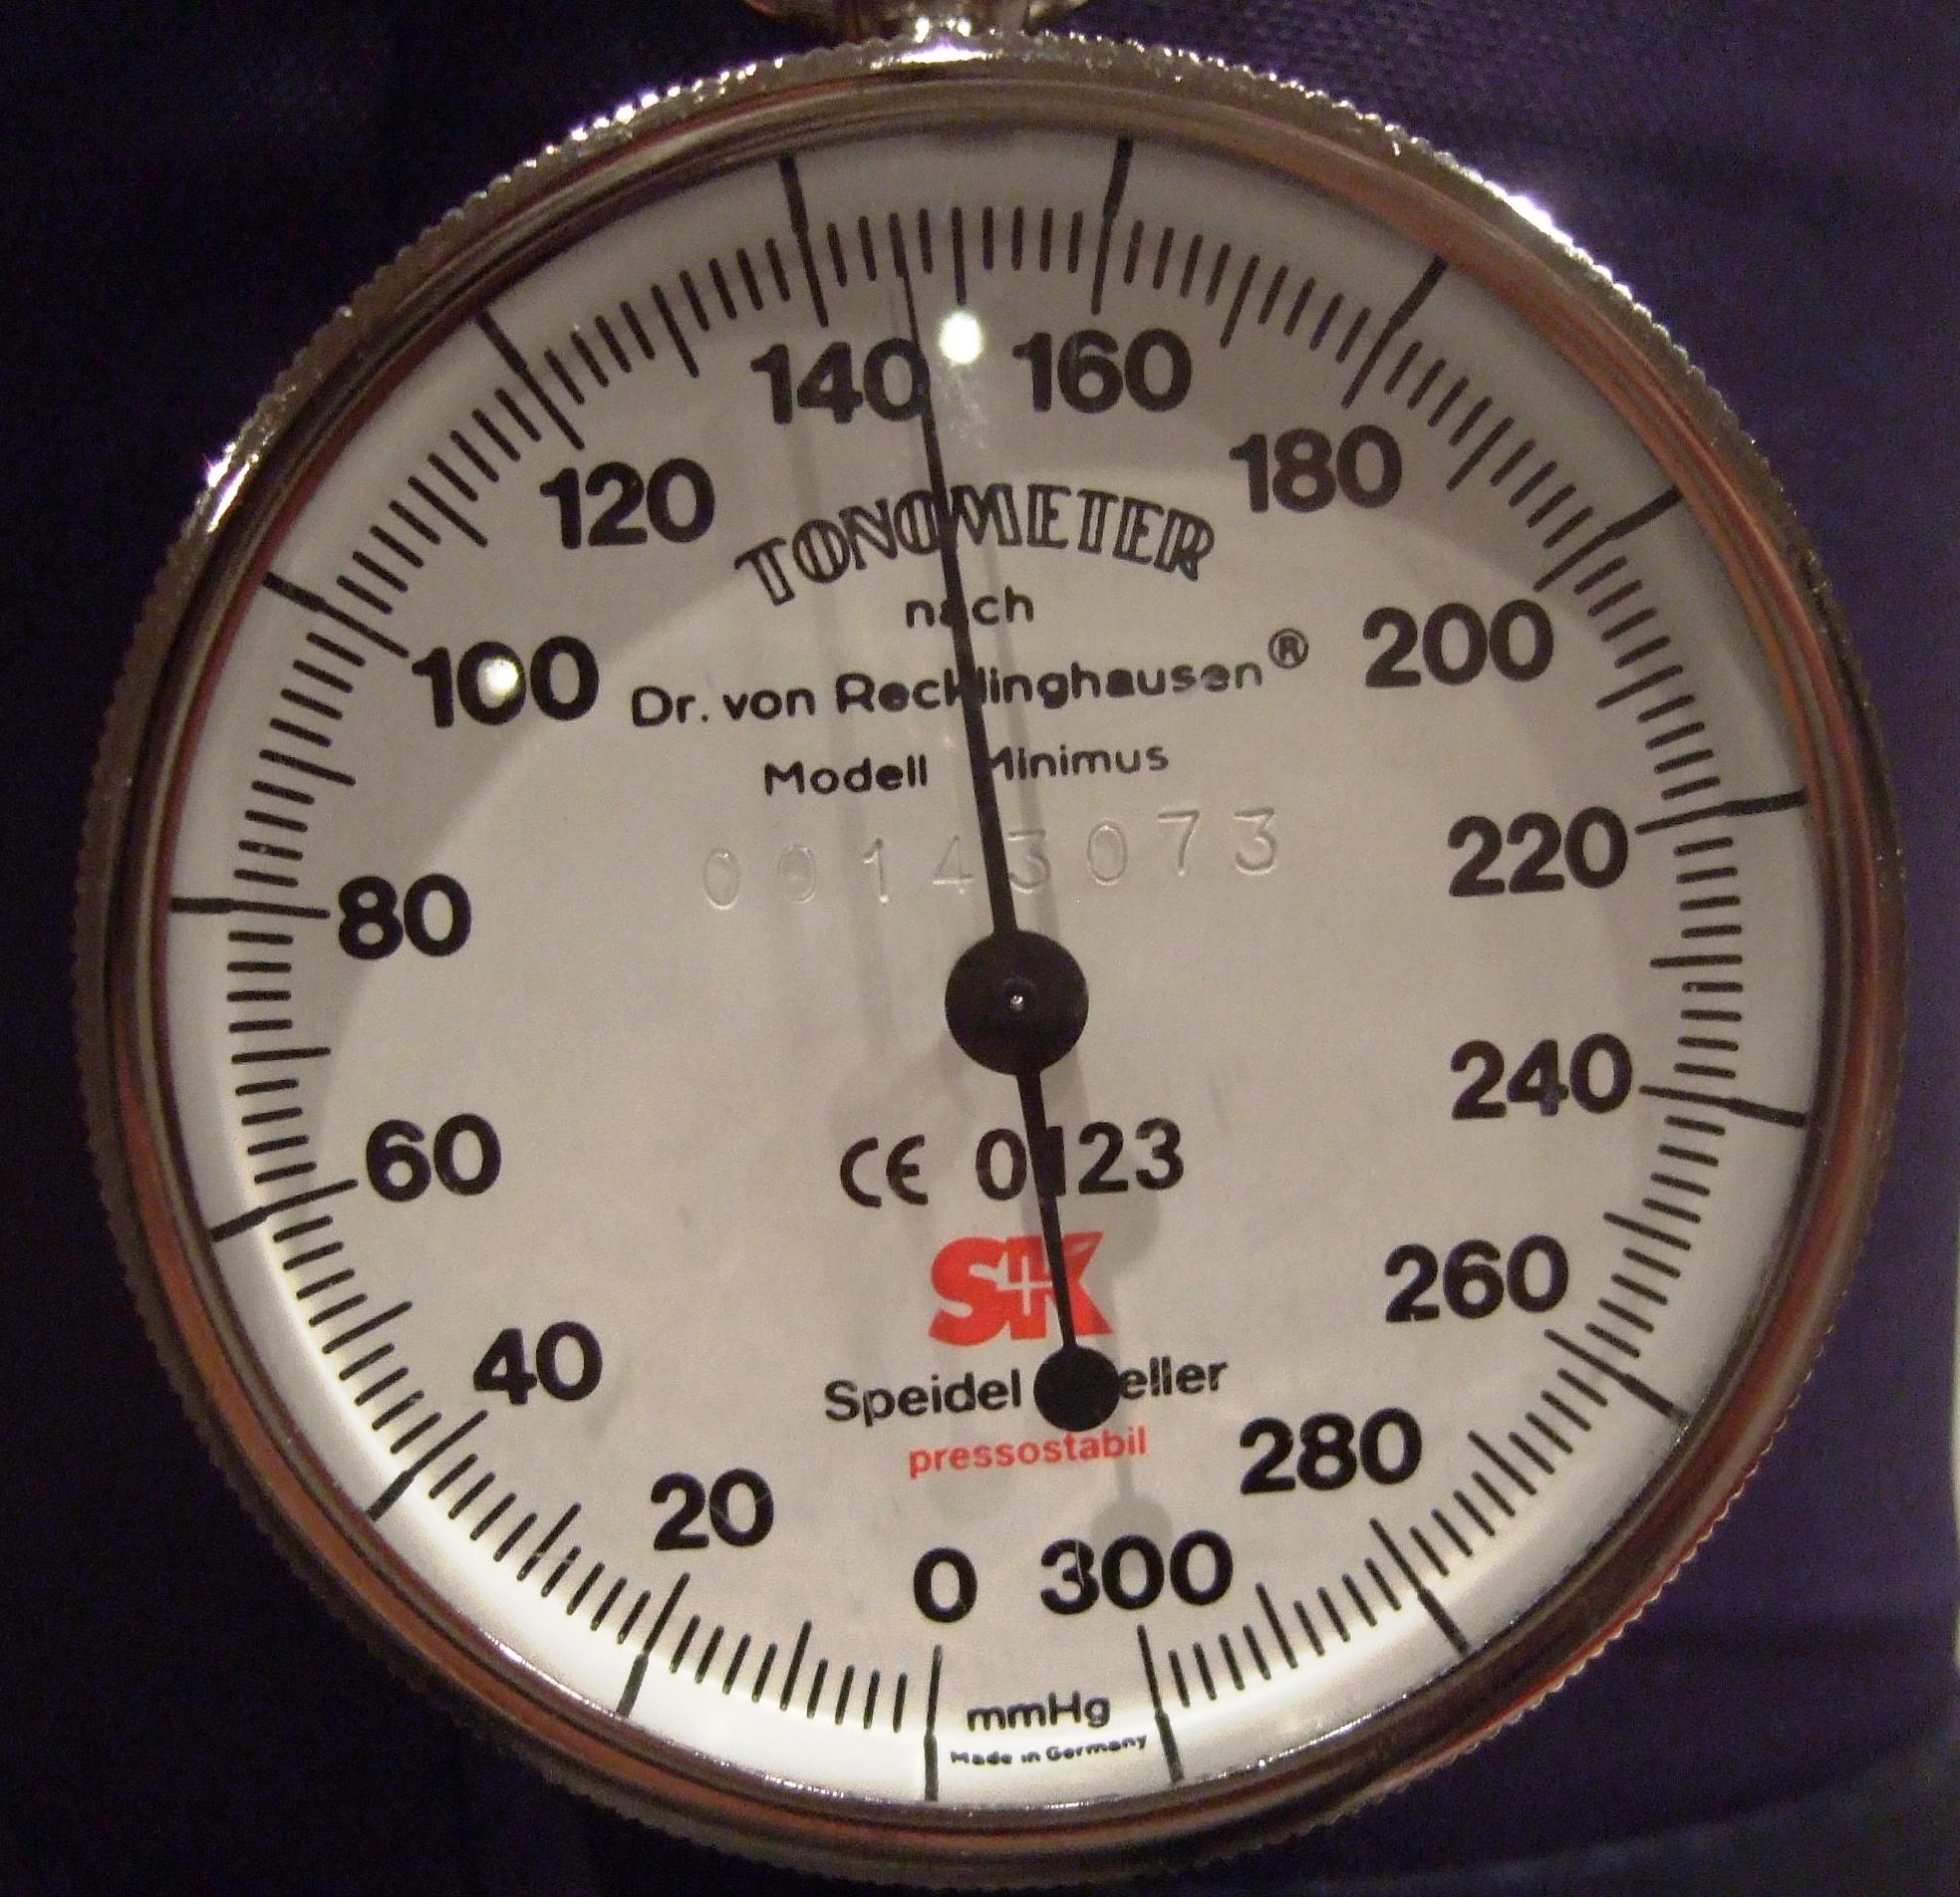 Yrsel p g a blodtrycksförändringar